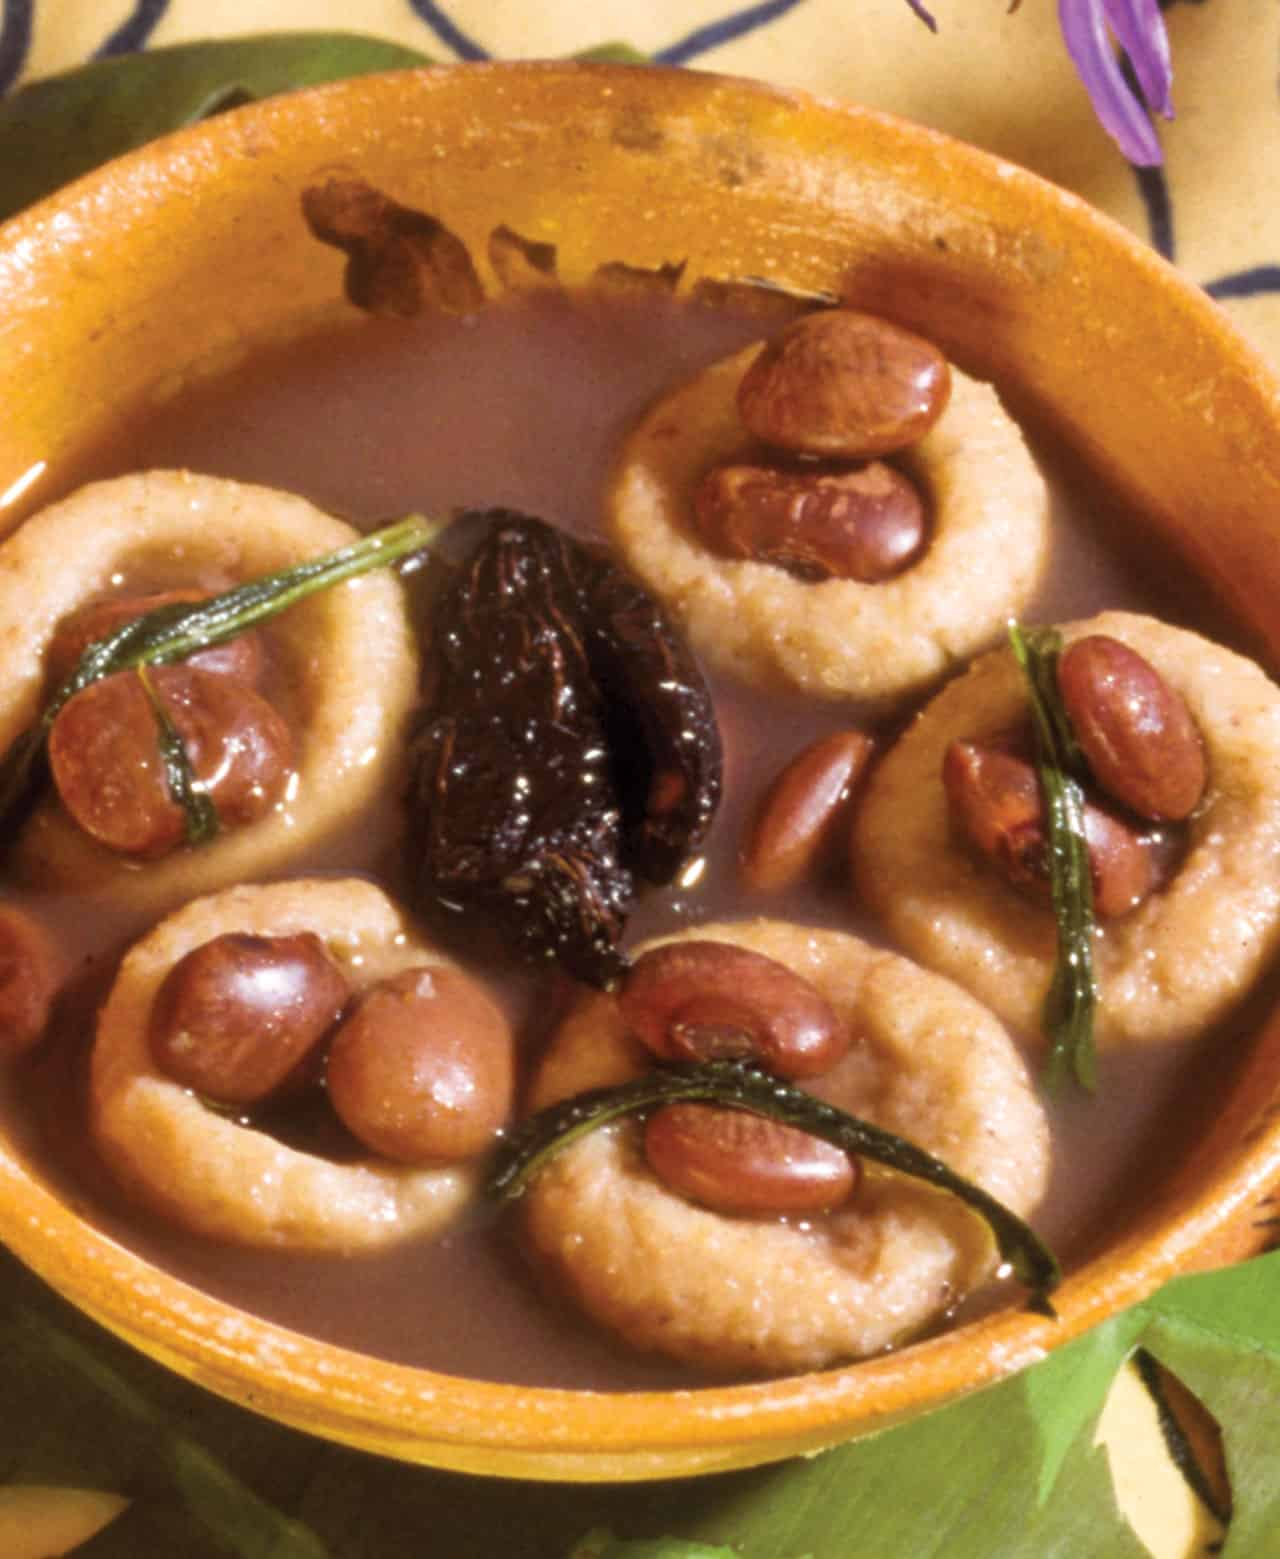 Foto: Bolitas de masa con frijoles en caldillo. (Bertha Herrera).